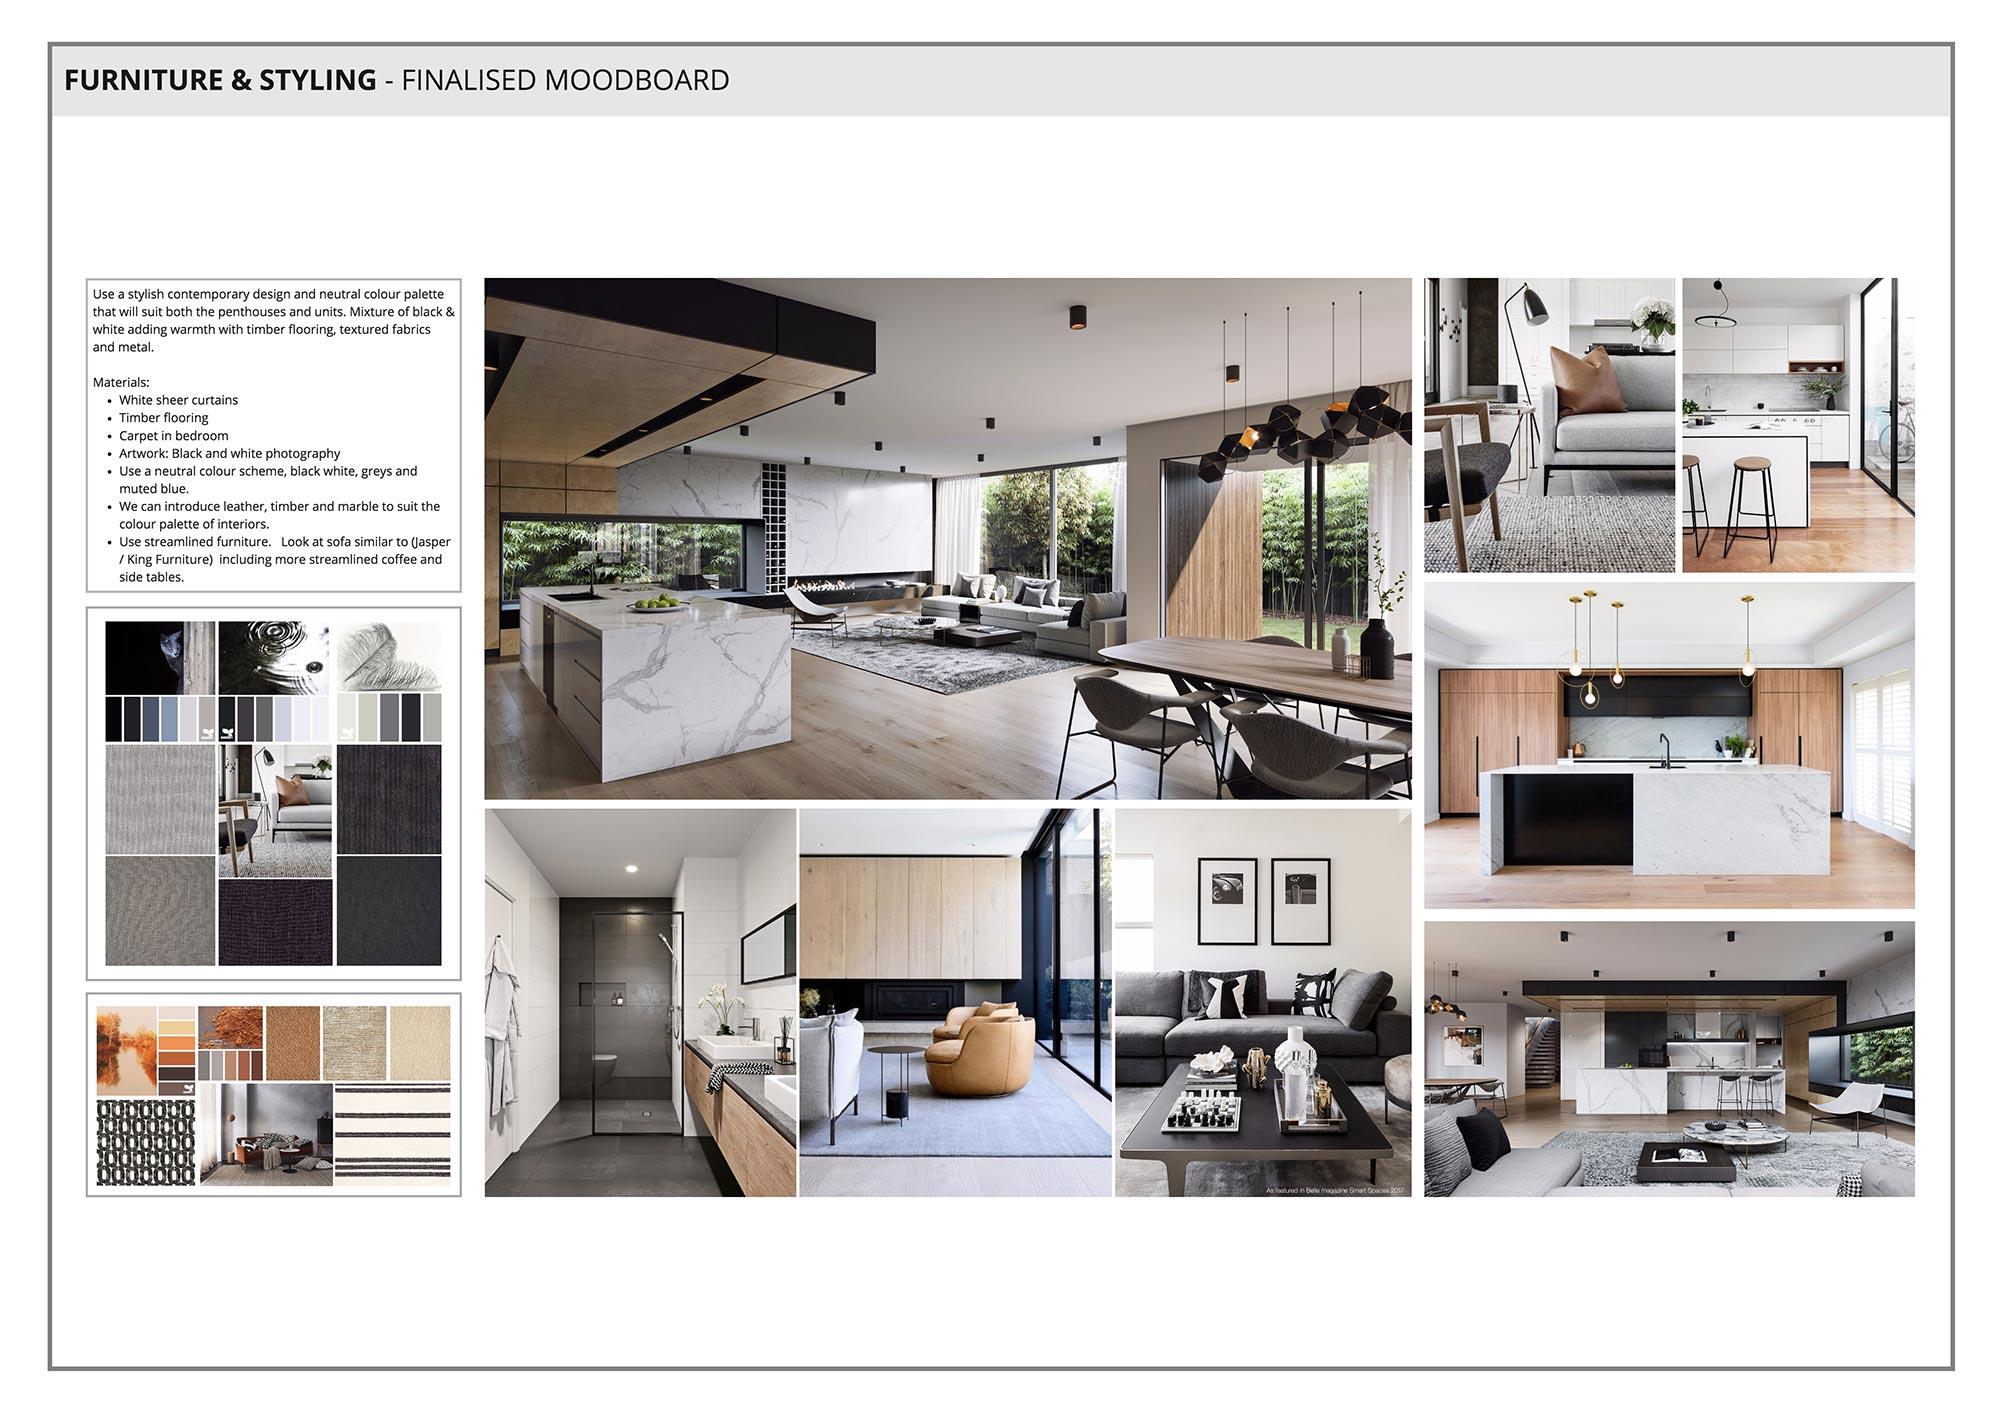 Furniture & Styling Moodboard